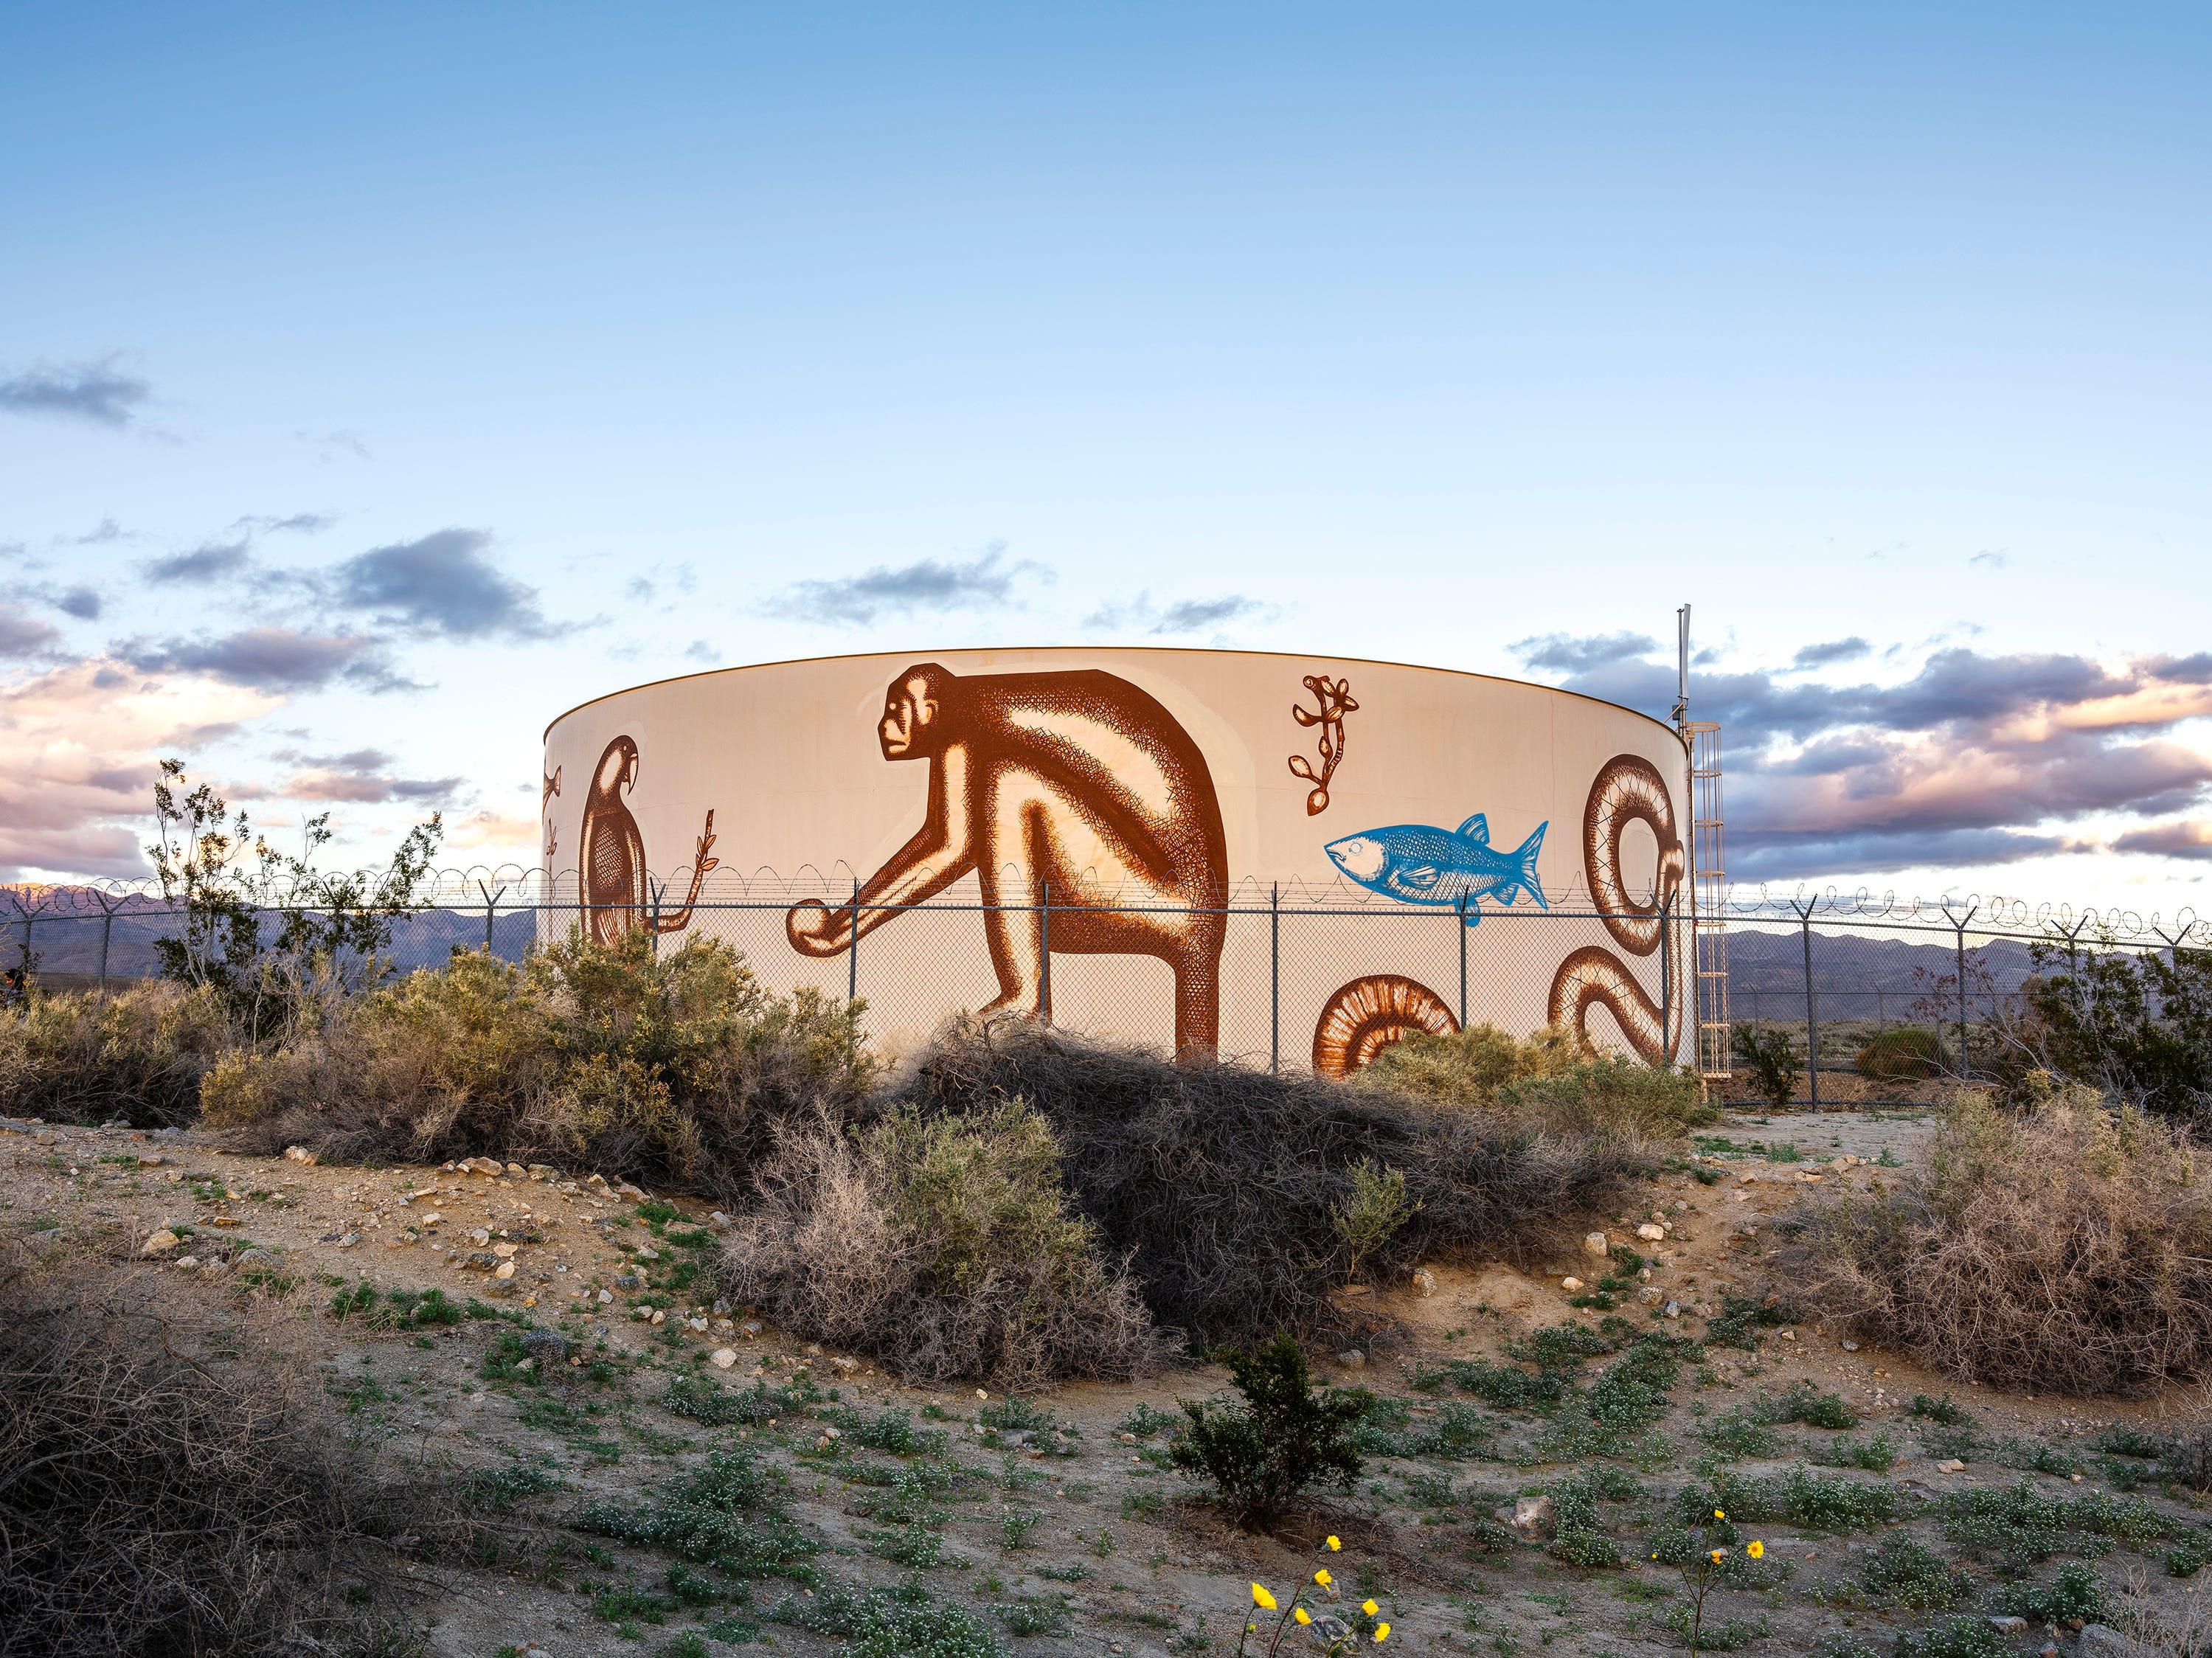 """Visit Us in the Shape of Clouds"" byArmando Lerma for Desert X 2019"